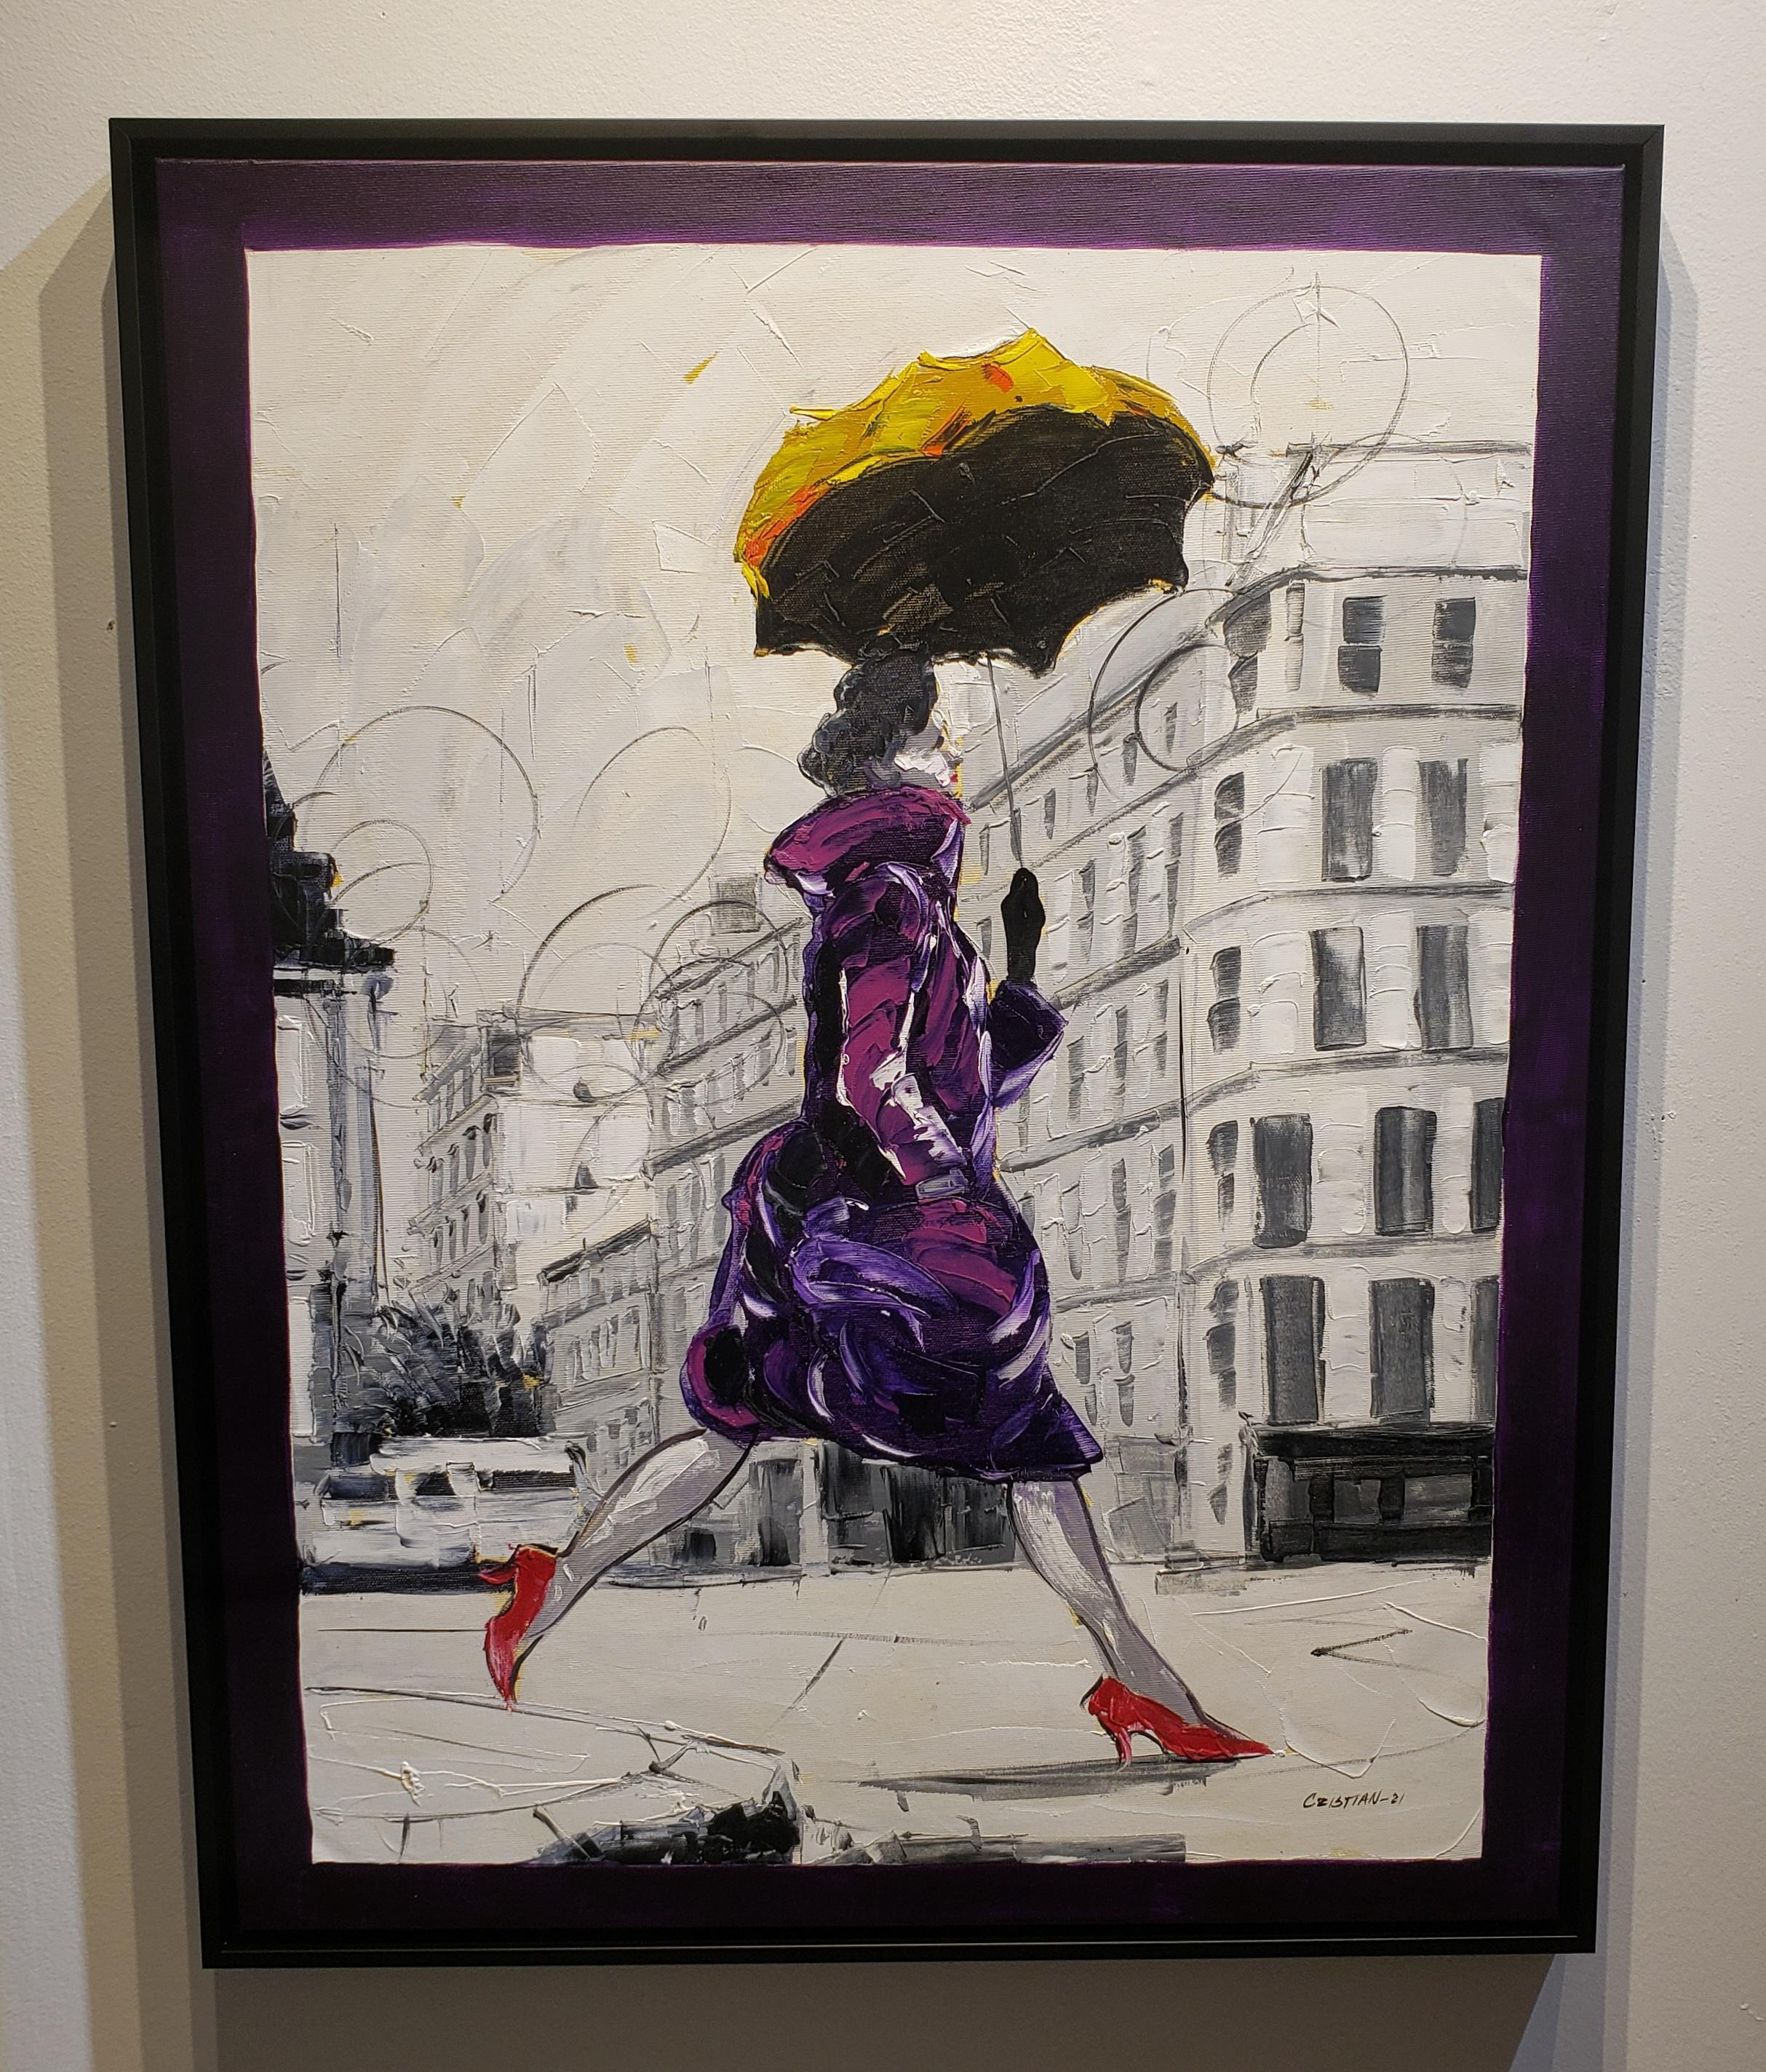 Coco in Paris VII. Impressionism,, Cuban artist. Paris, France, Oil on Canvas